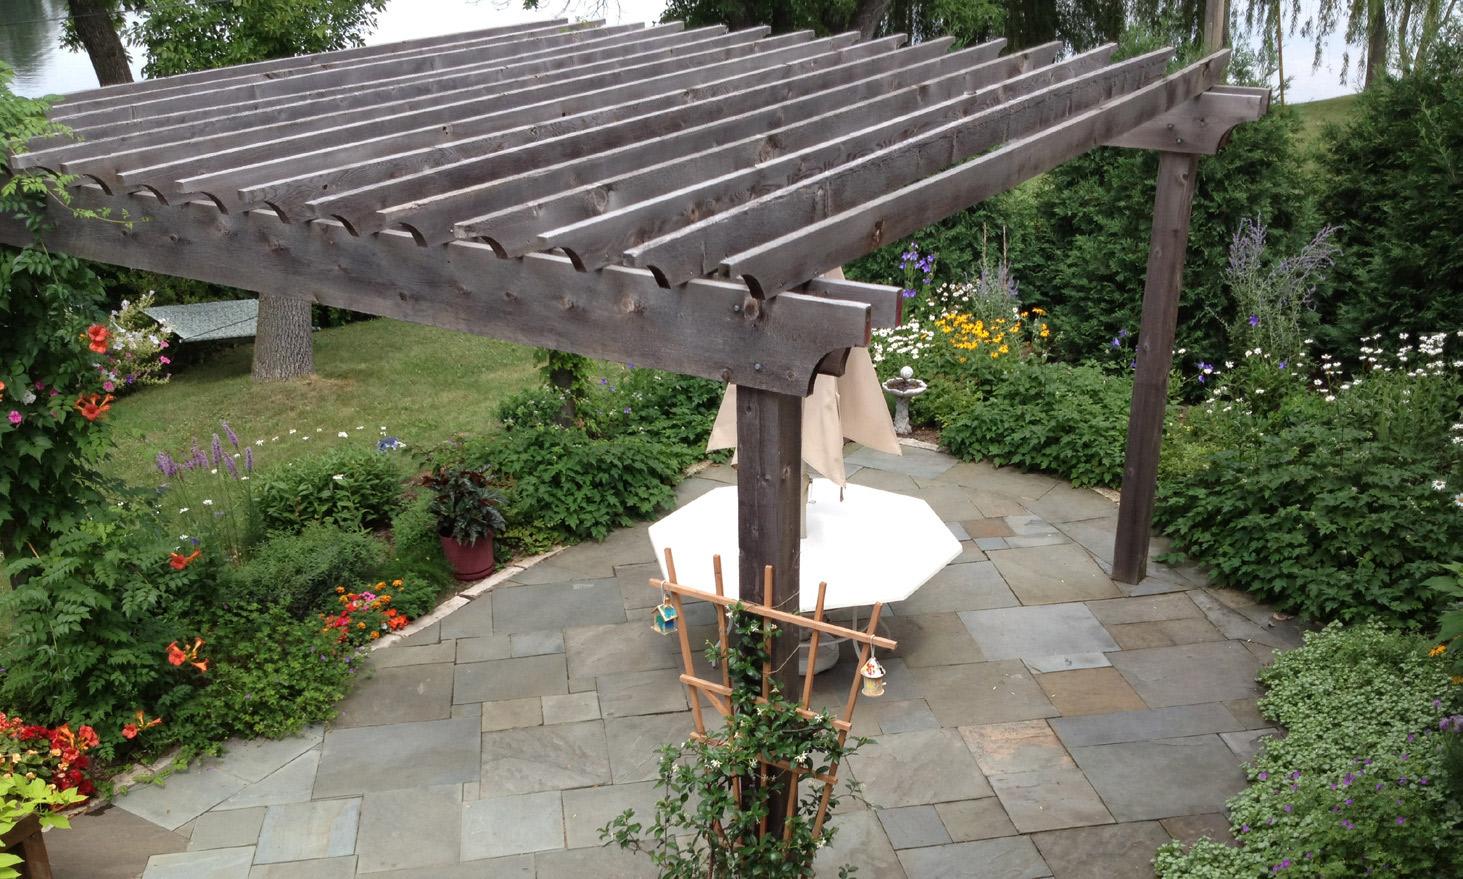 residential landscape design birmingham al » Design and Ideas